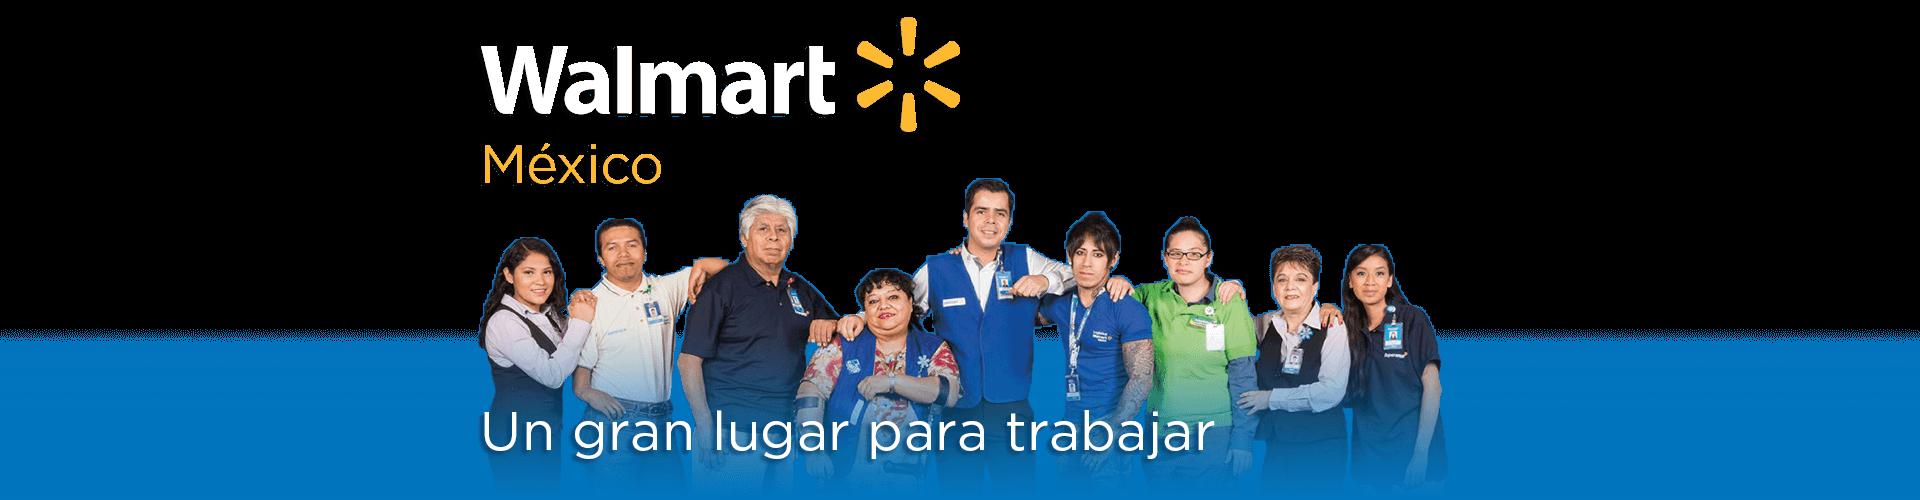 Walmart México, un gran lugar para trabajar